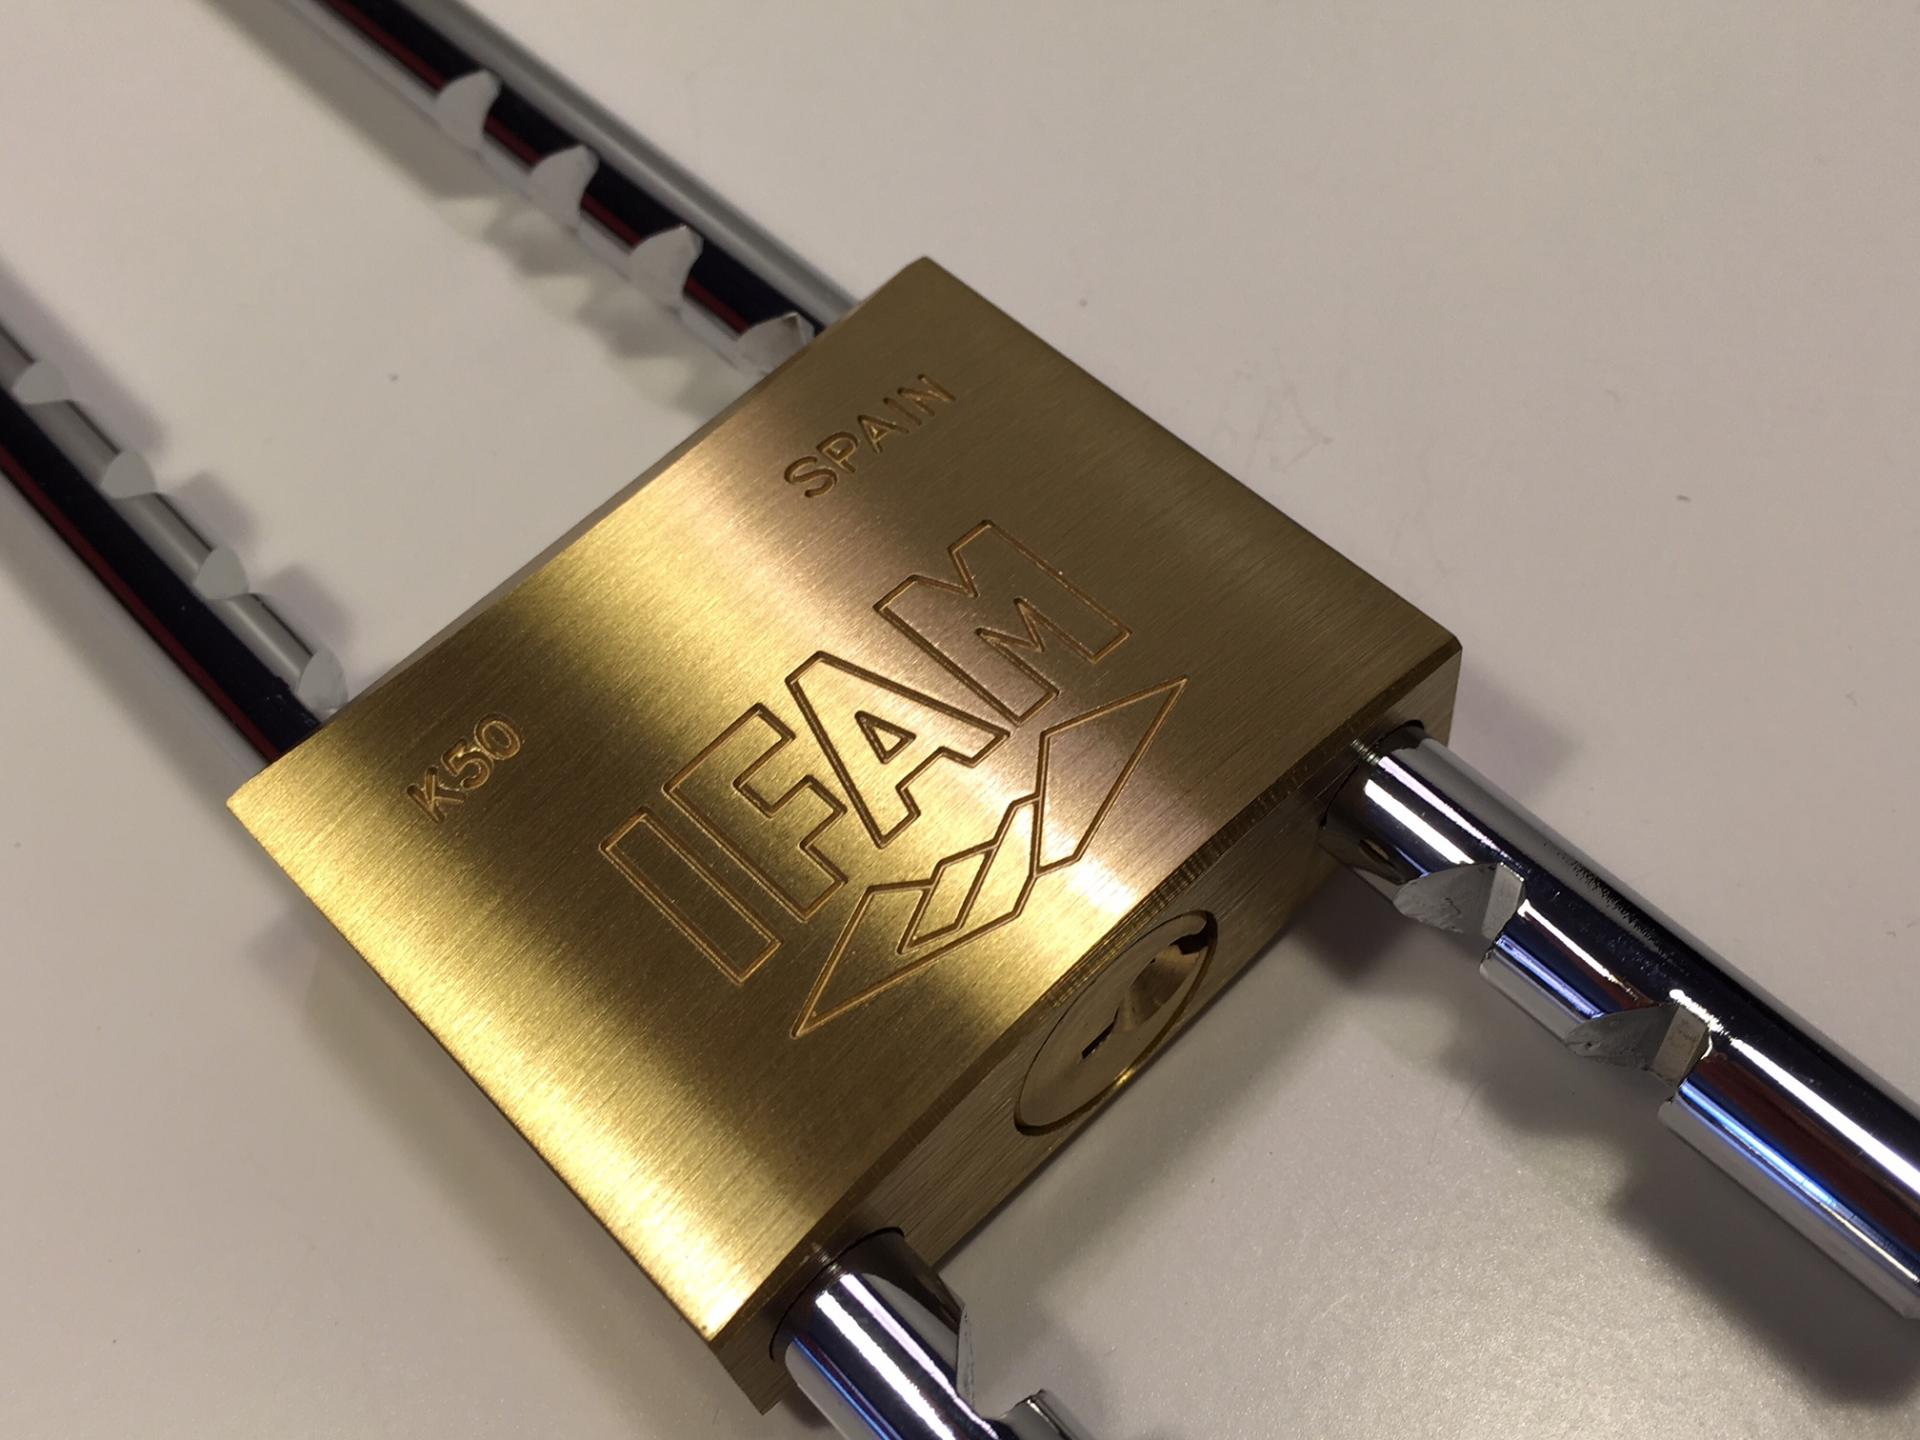 Cadenas 50 mm avec anse adaptable ifam